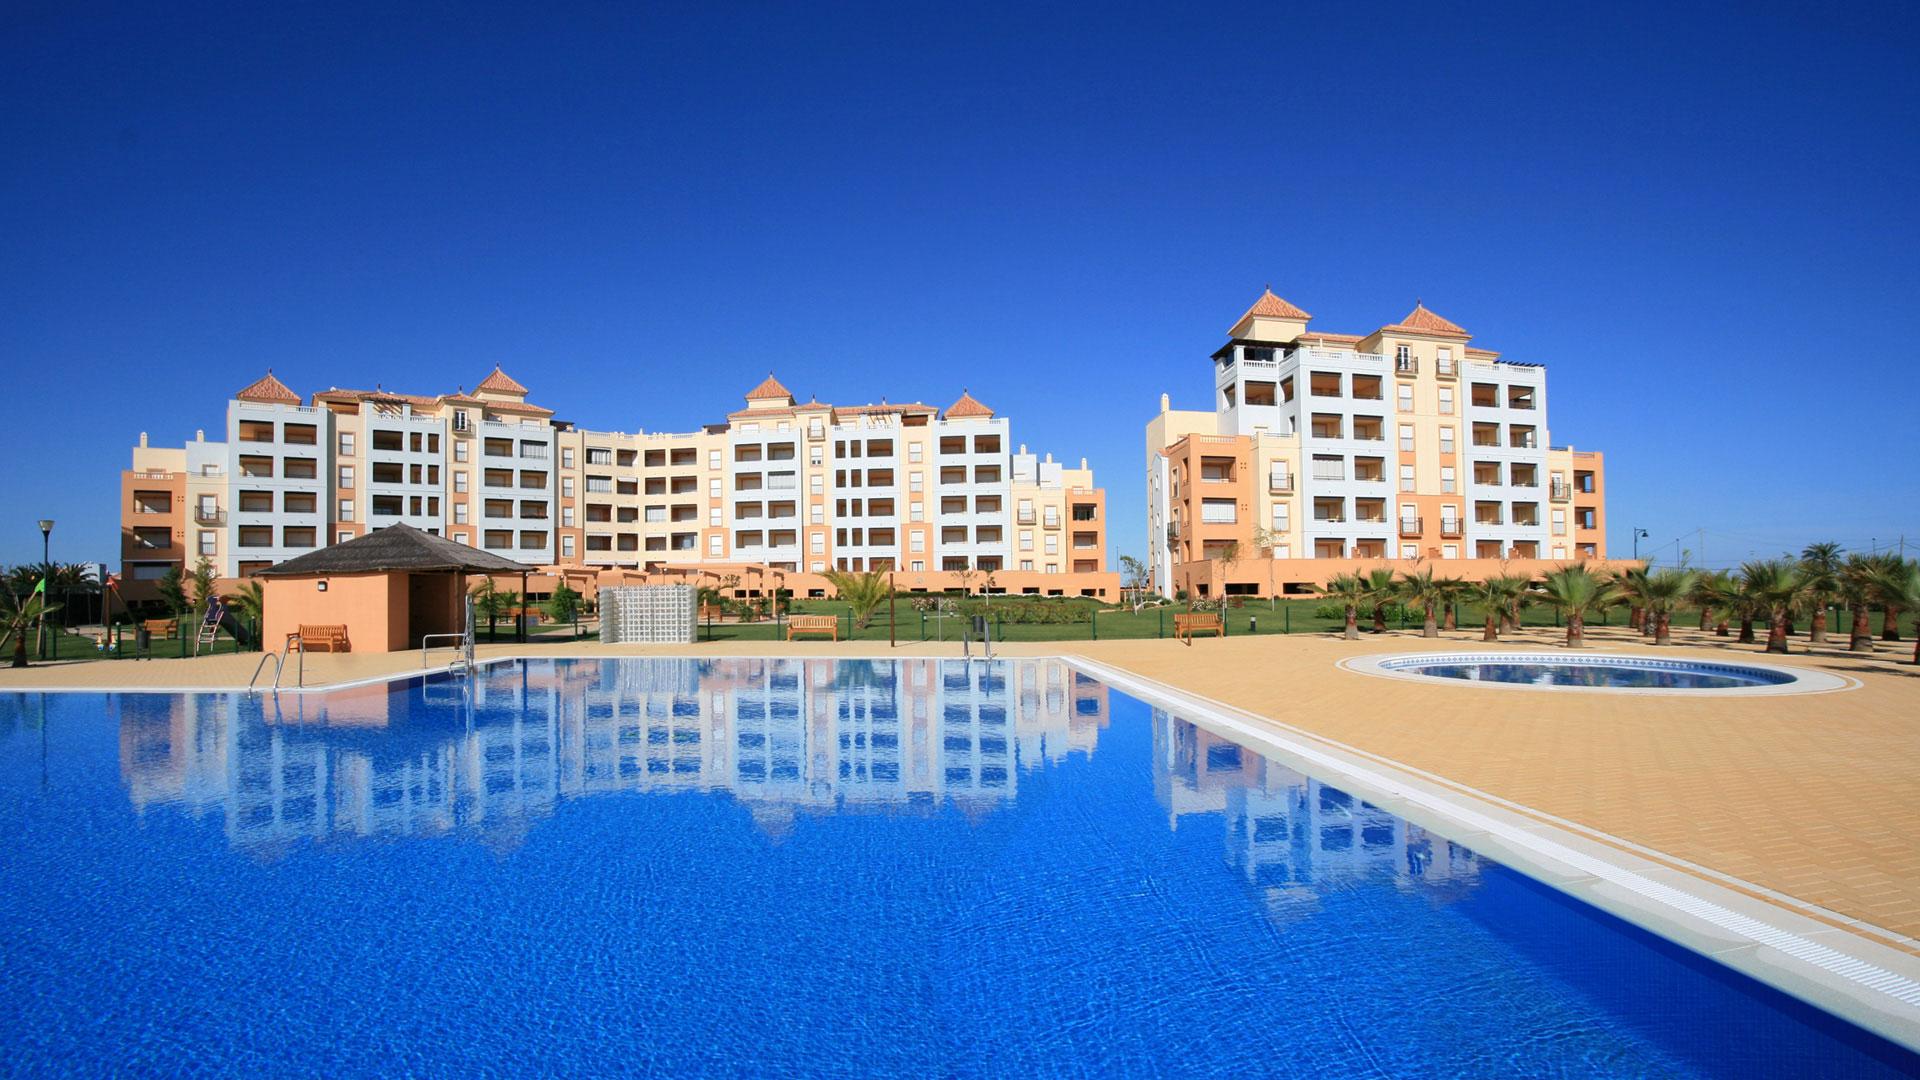 Nieuwbouw project in Isla Canela (Spanje, Costa de la Luz)